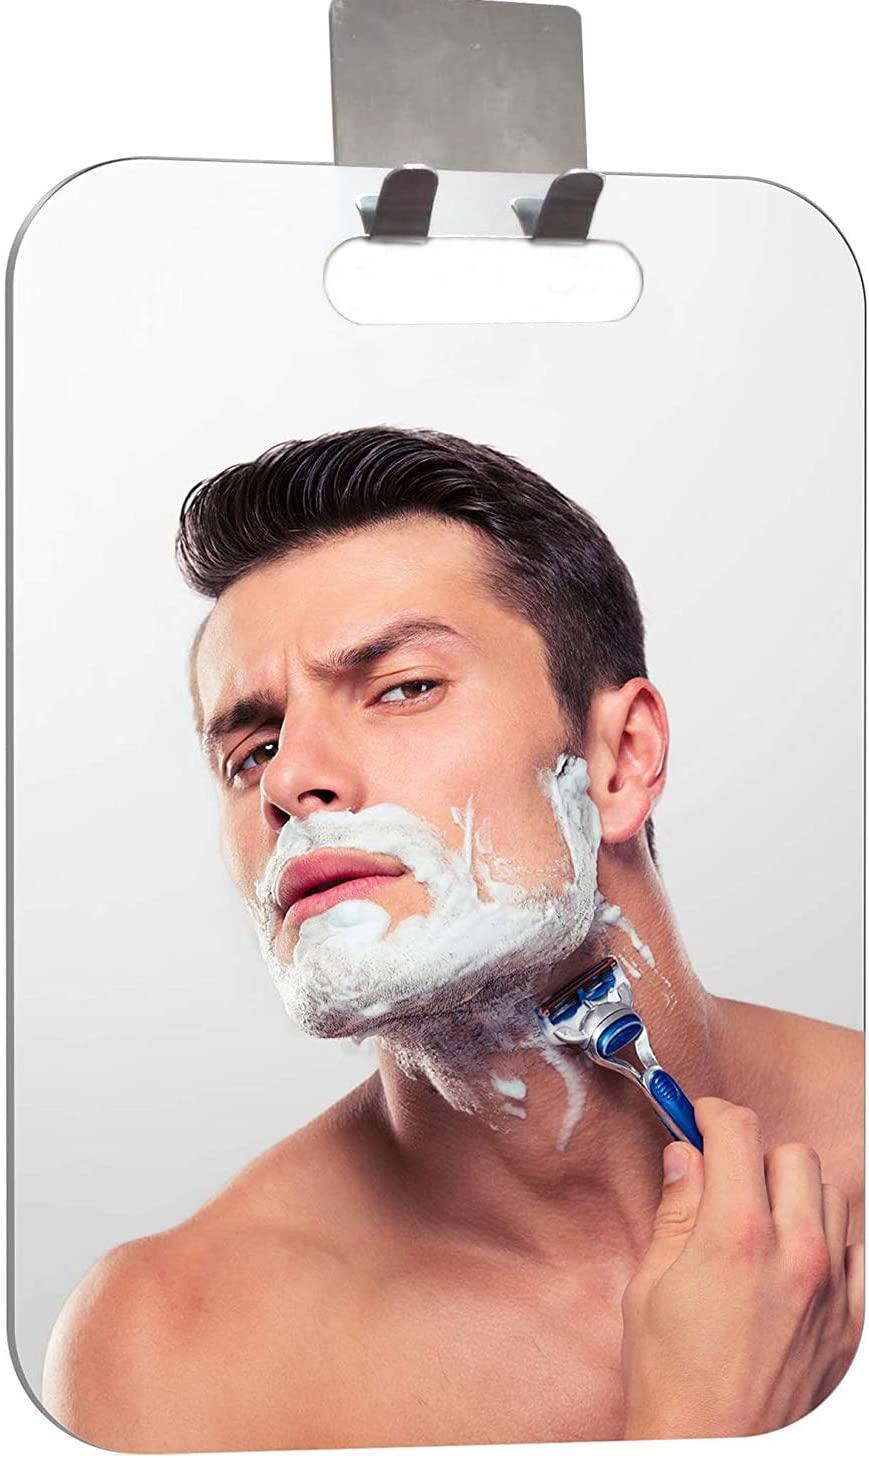 xoyo fogless shower mirror